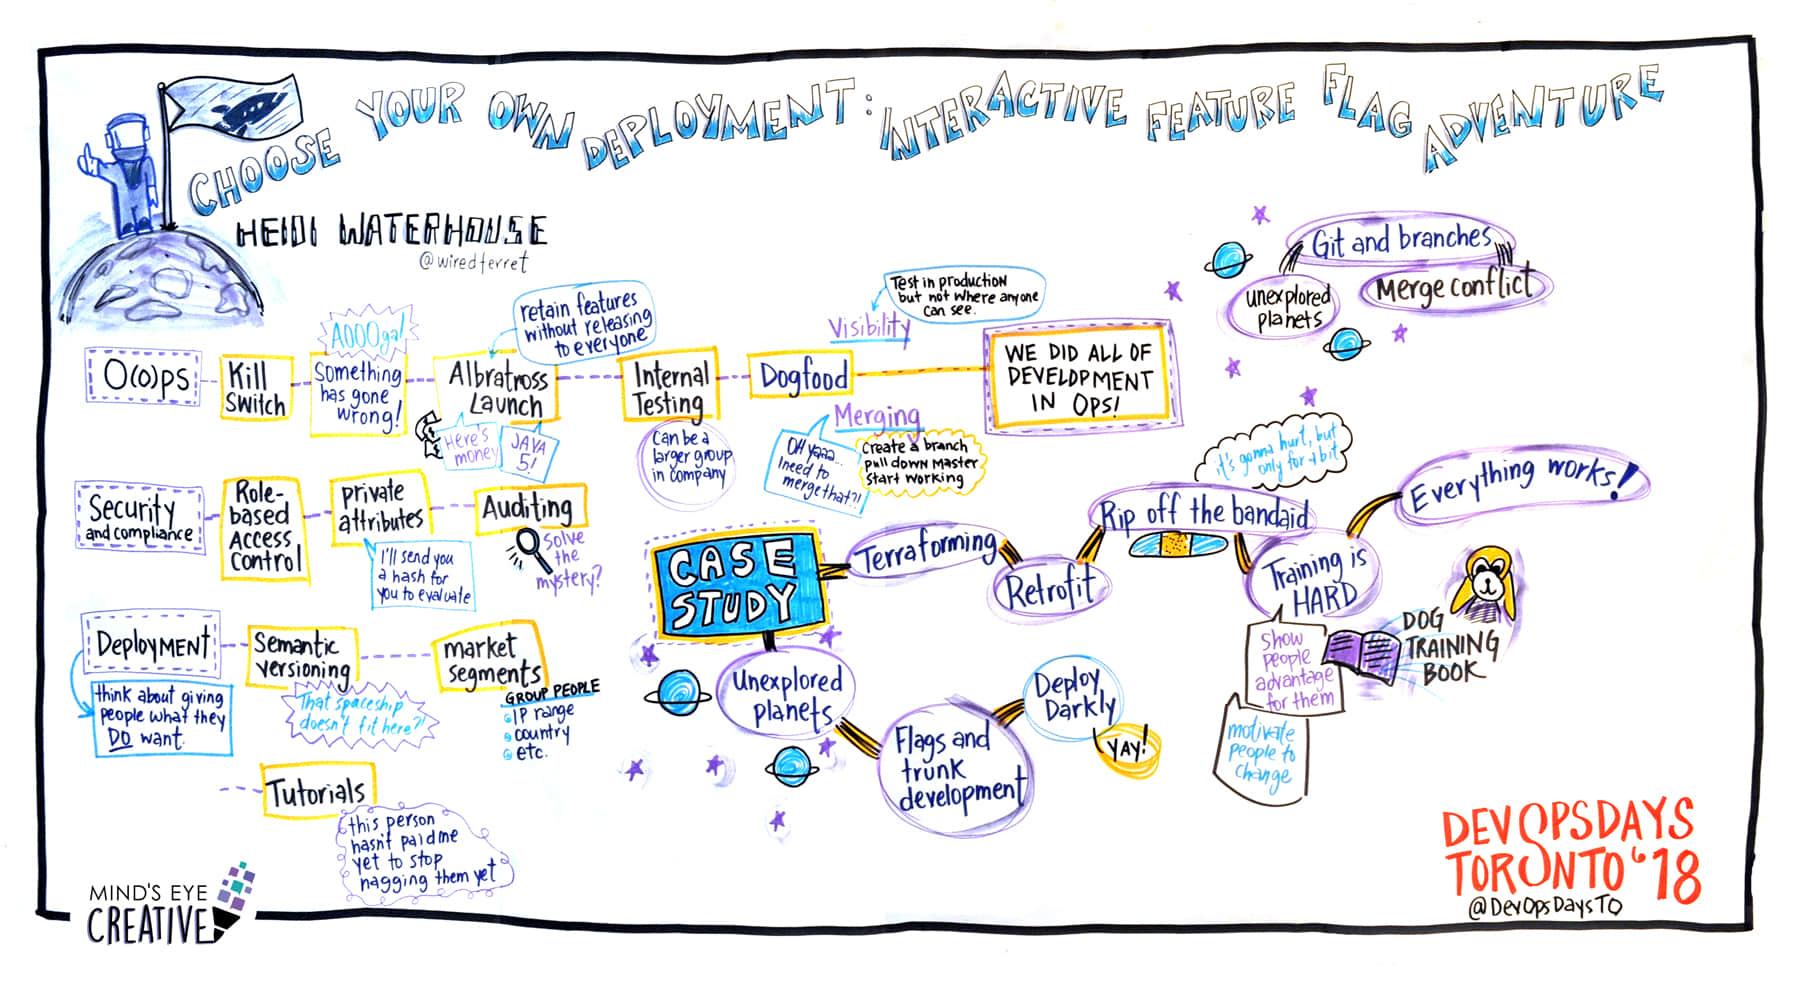 Graphic facilitation at DevOps Days in Toronto 2018